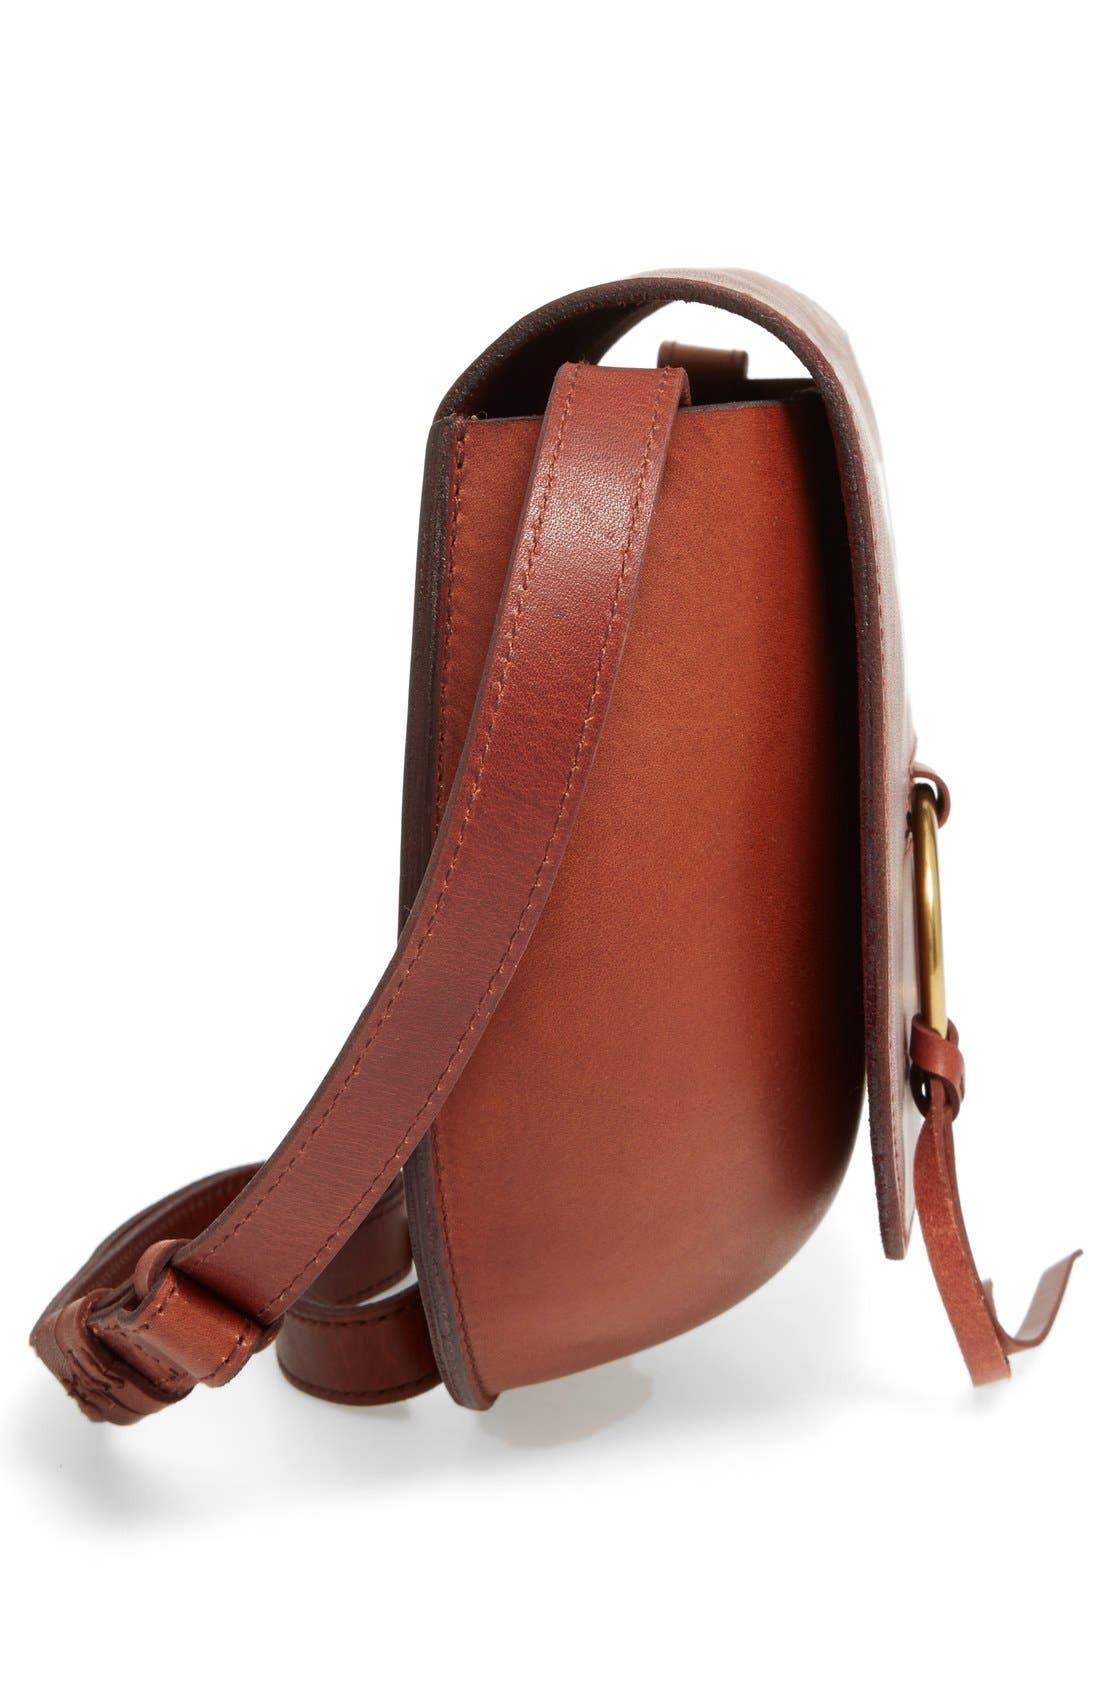 O-Ring Leather Saddle Bag,                             Alternate thumbnail 4, color,                             200